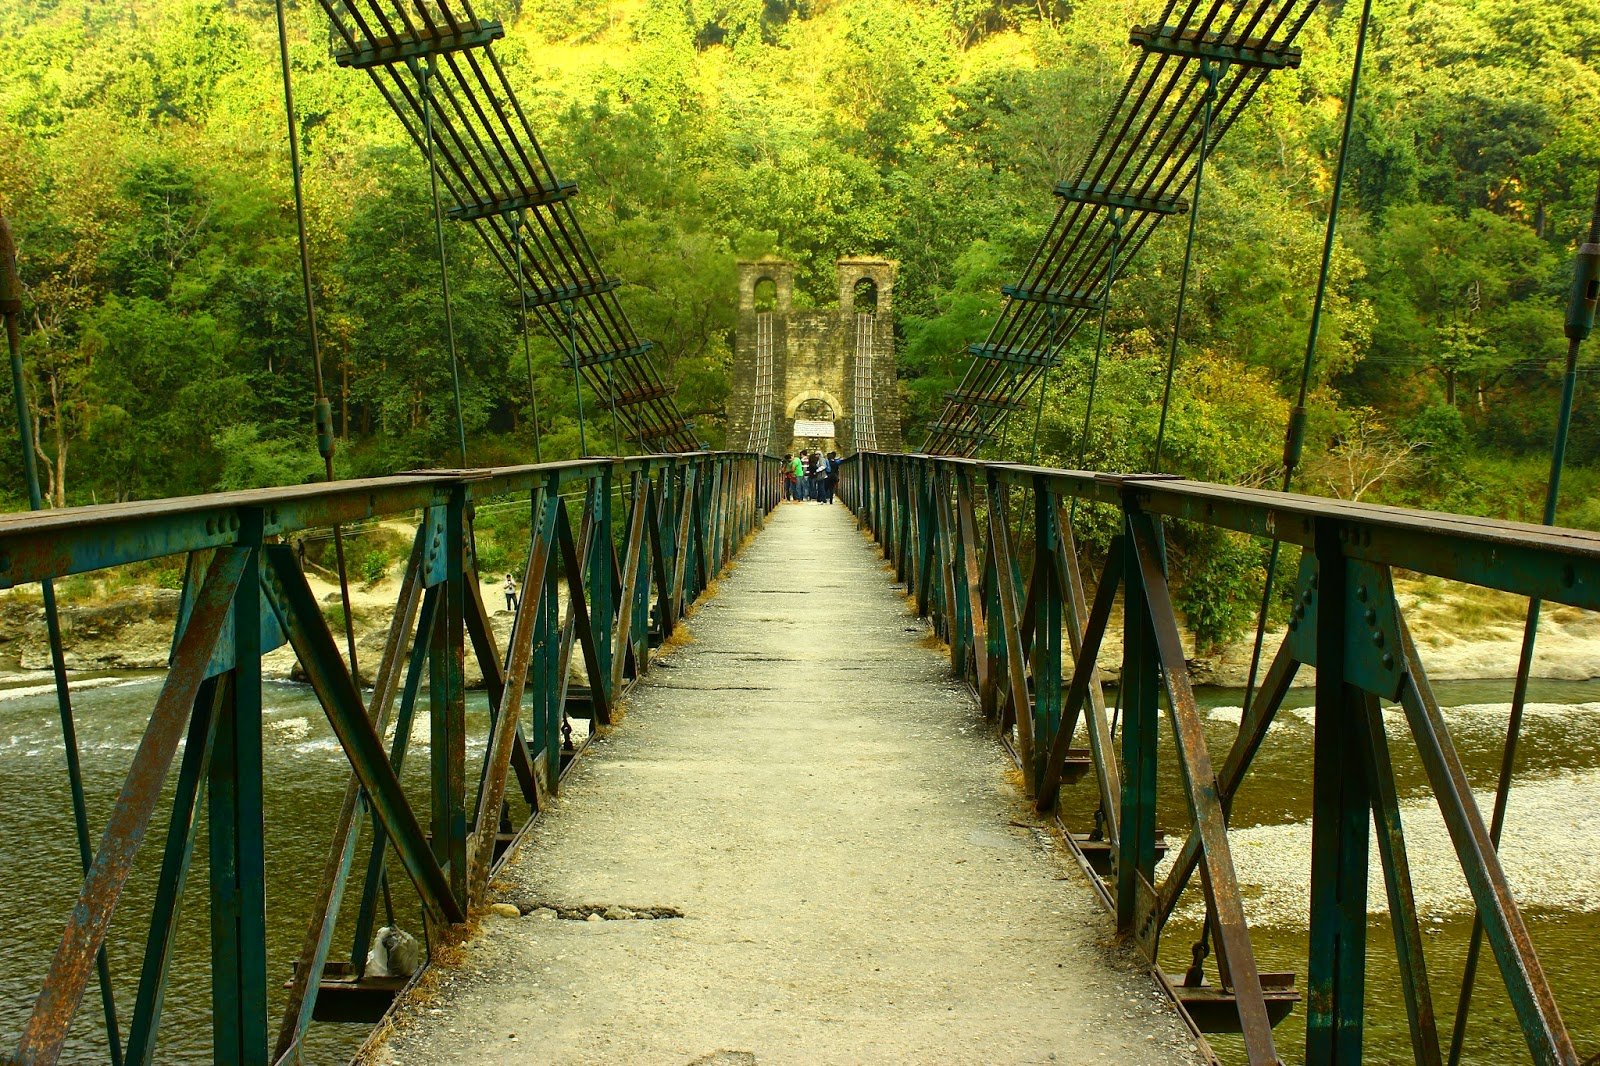 eagle bridge single catholic girls Girls tennis elyria 4, vermilion 1 singles  girls golf elyria catholic at legga  olmsted falls, westlake at swc preview (eagle .